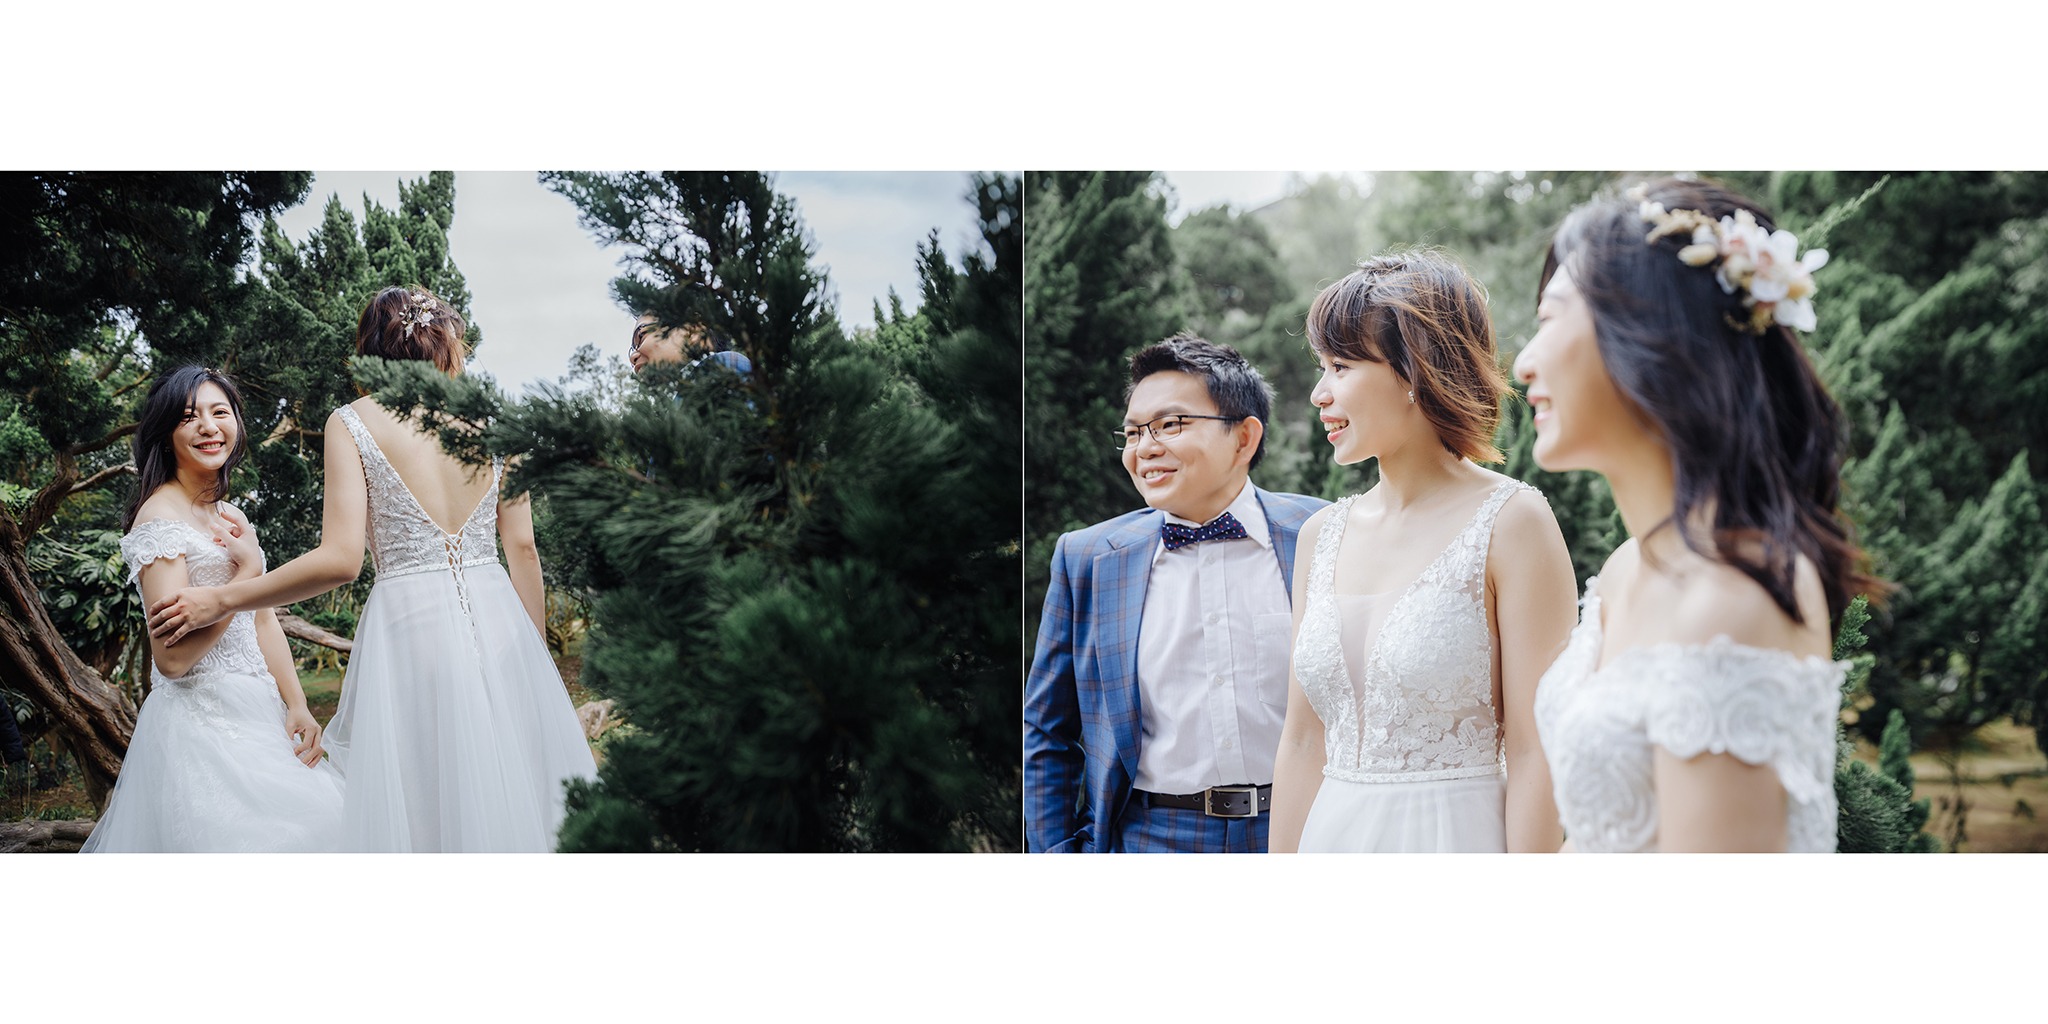 40901352843 ca504501e3 o - 【閨蜜婚紗】+育誠&娟羽&映煦+